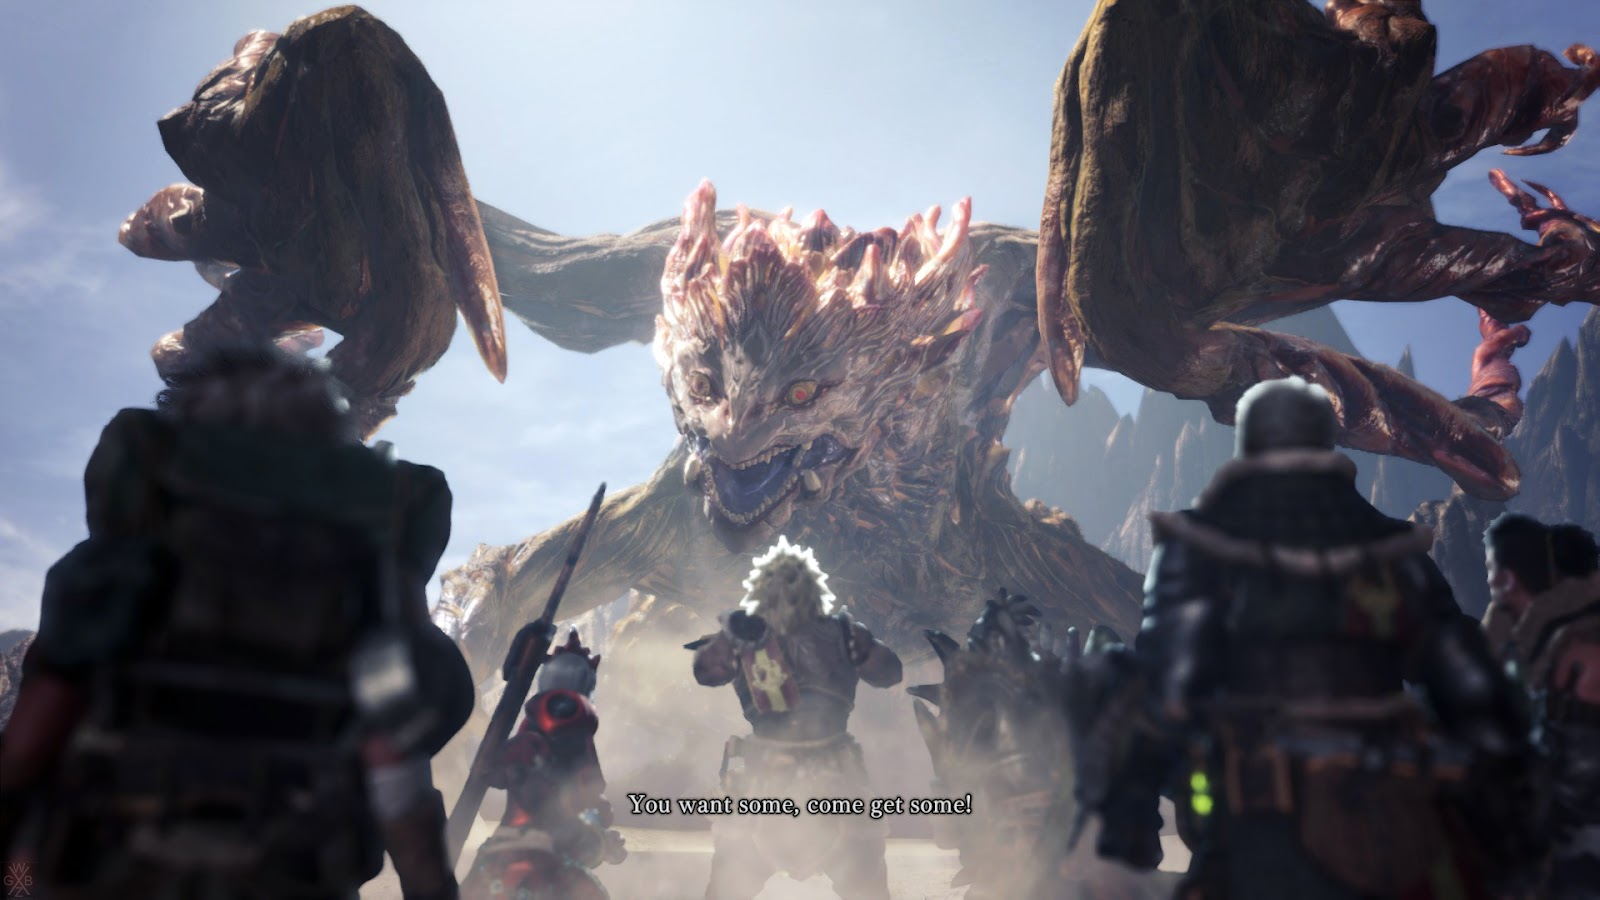 Monster Hunter World Iceborne À¹€à¸ˆà¸²à¸°à¸¥ À¸à¸¡à¸à¸™à¸ªà¹€à¸•à¸à¸£ Shara Ishvalda Mhw iceborne ost shara ishvalda theme 2. gamefever